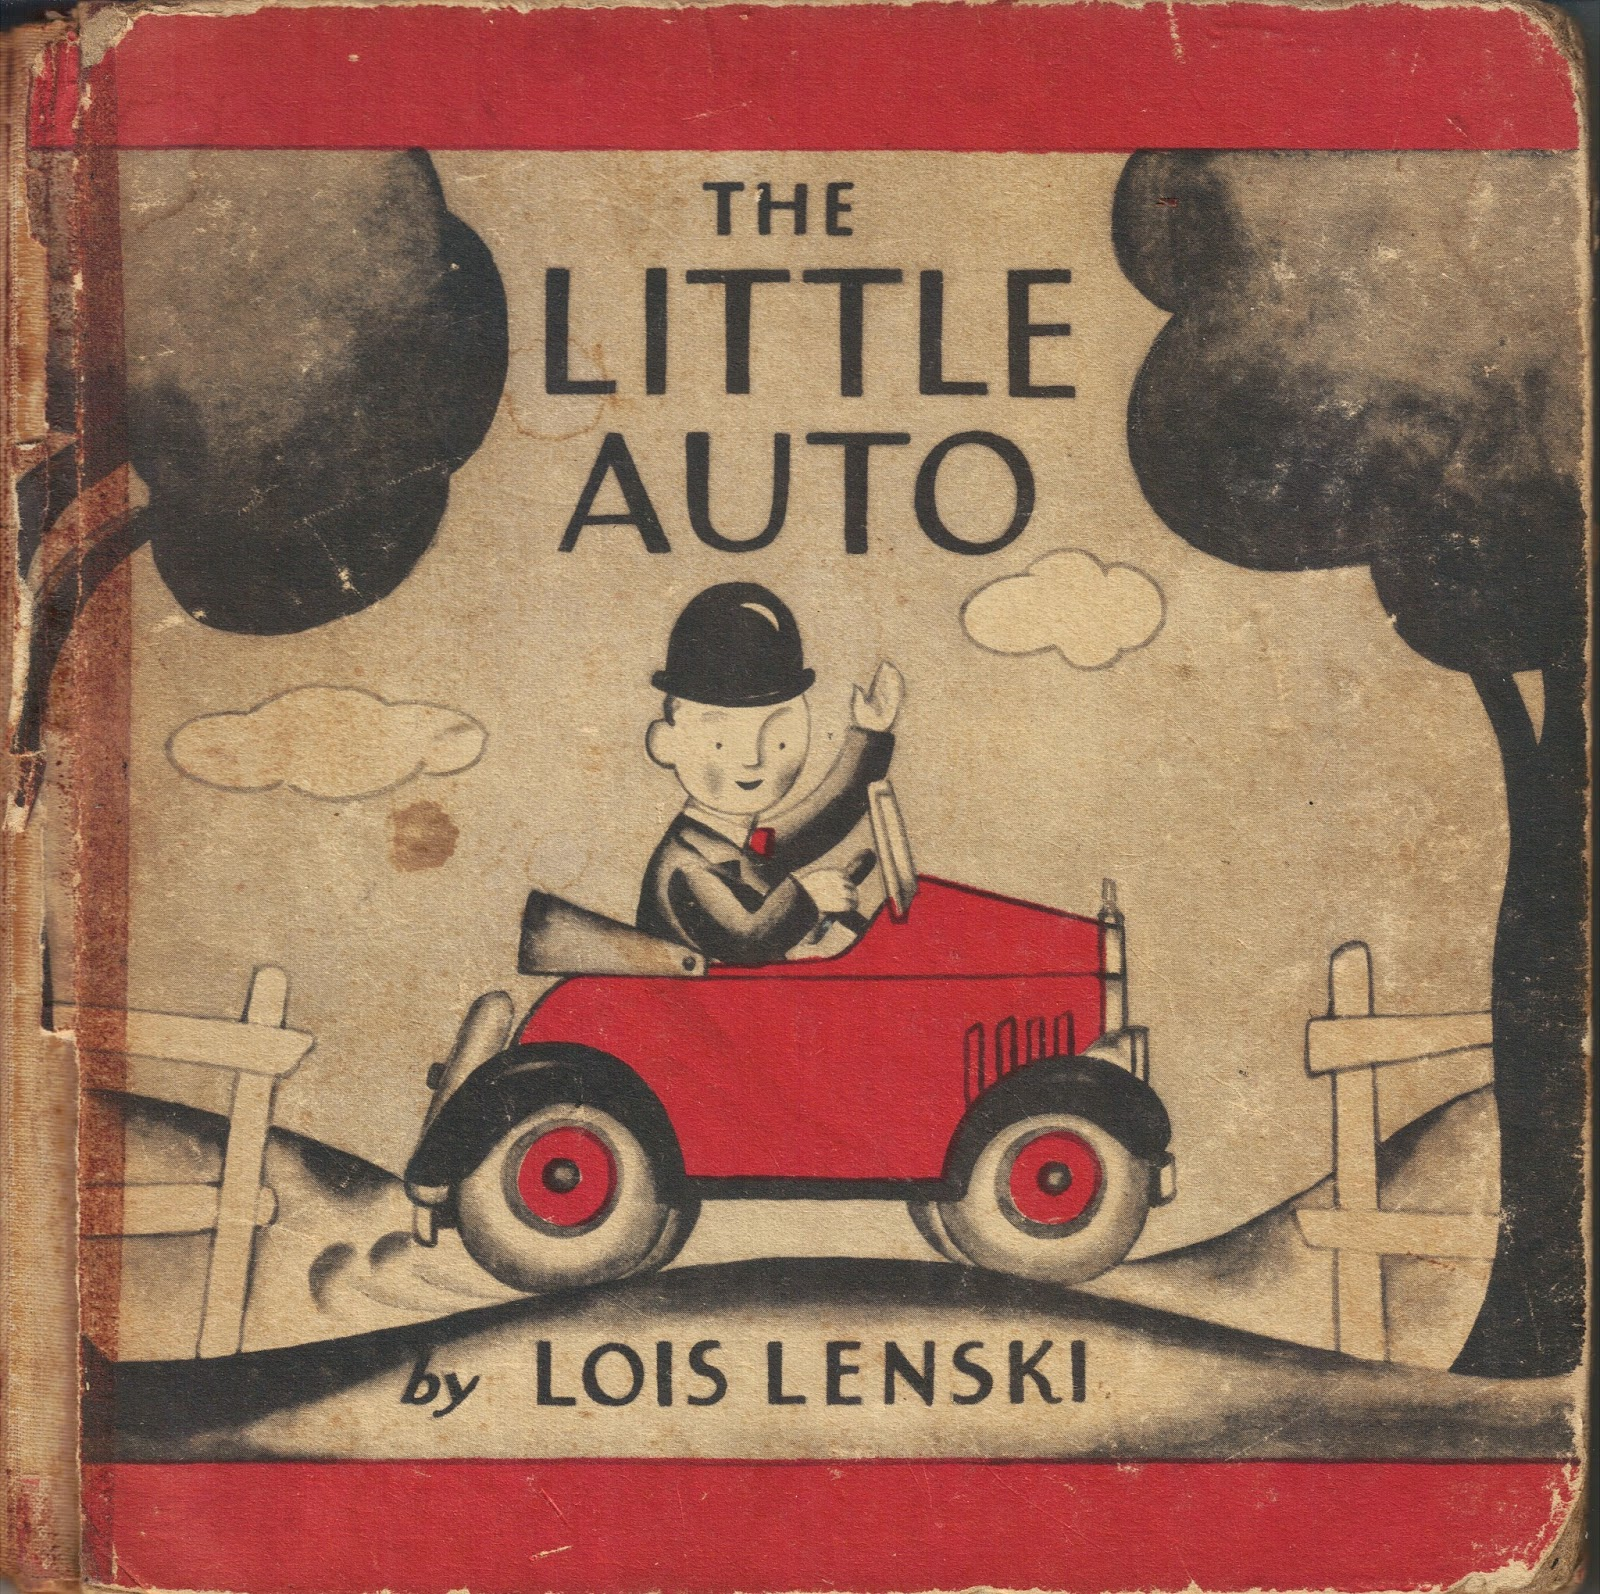 The Little Auto by Lois Lenski via  Brickbatbooks.com